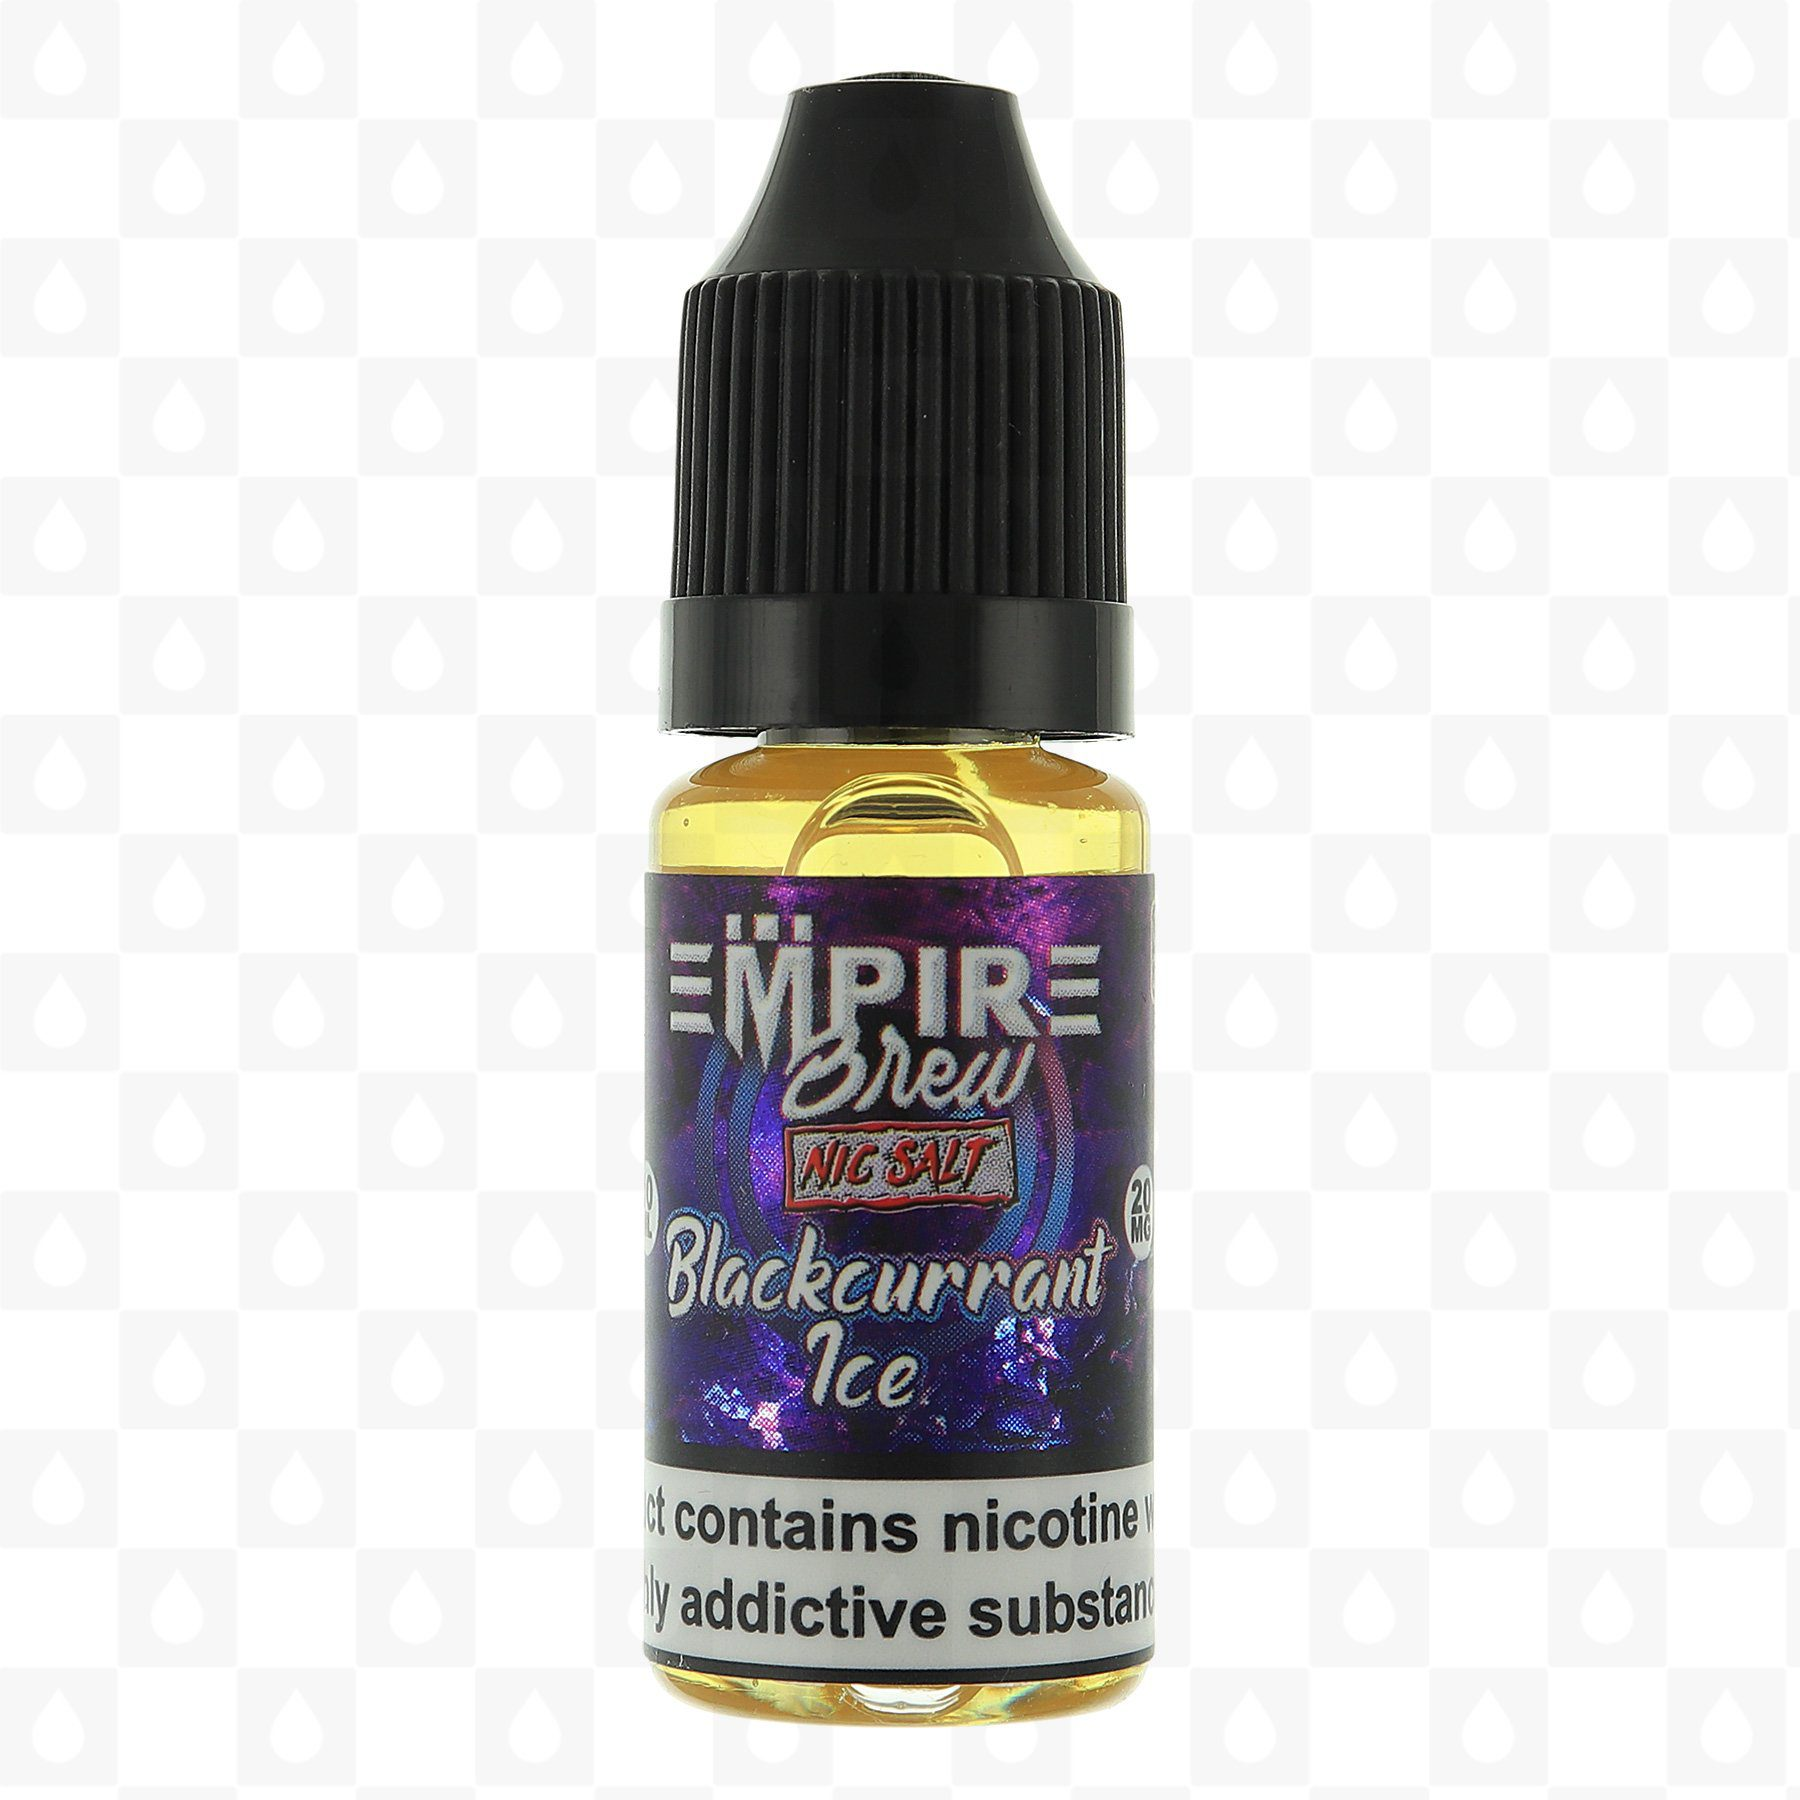 Empire Brew Blackcurrant Ice Nic Salt 10ml E-Liquid